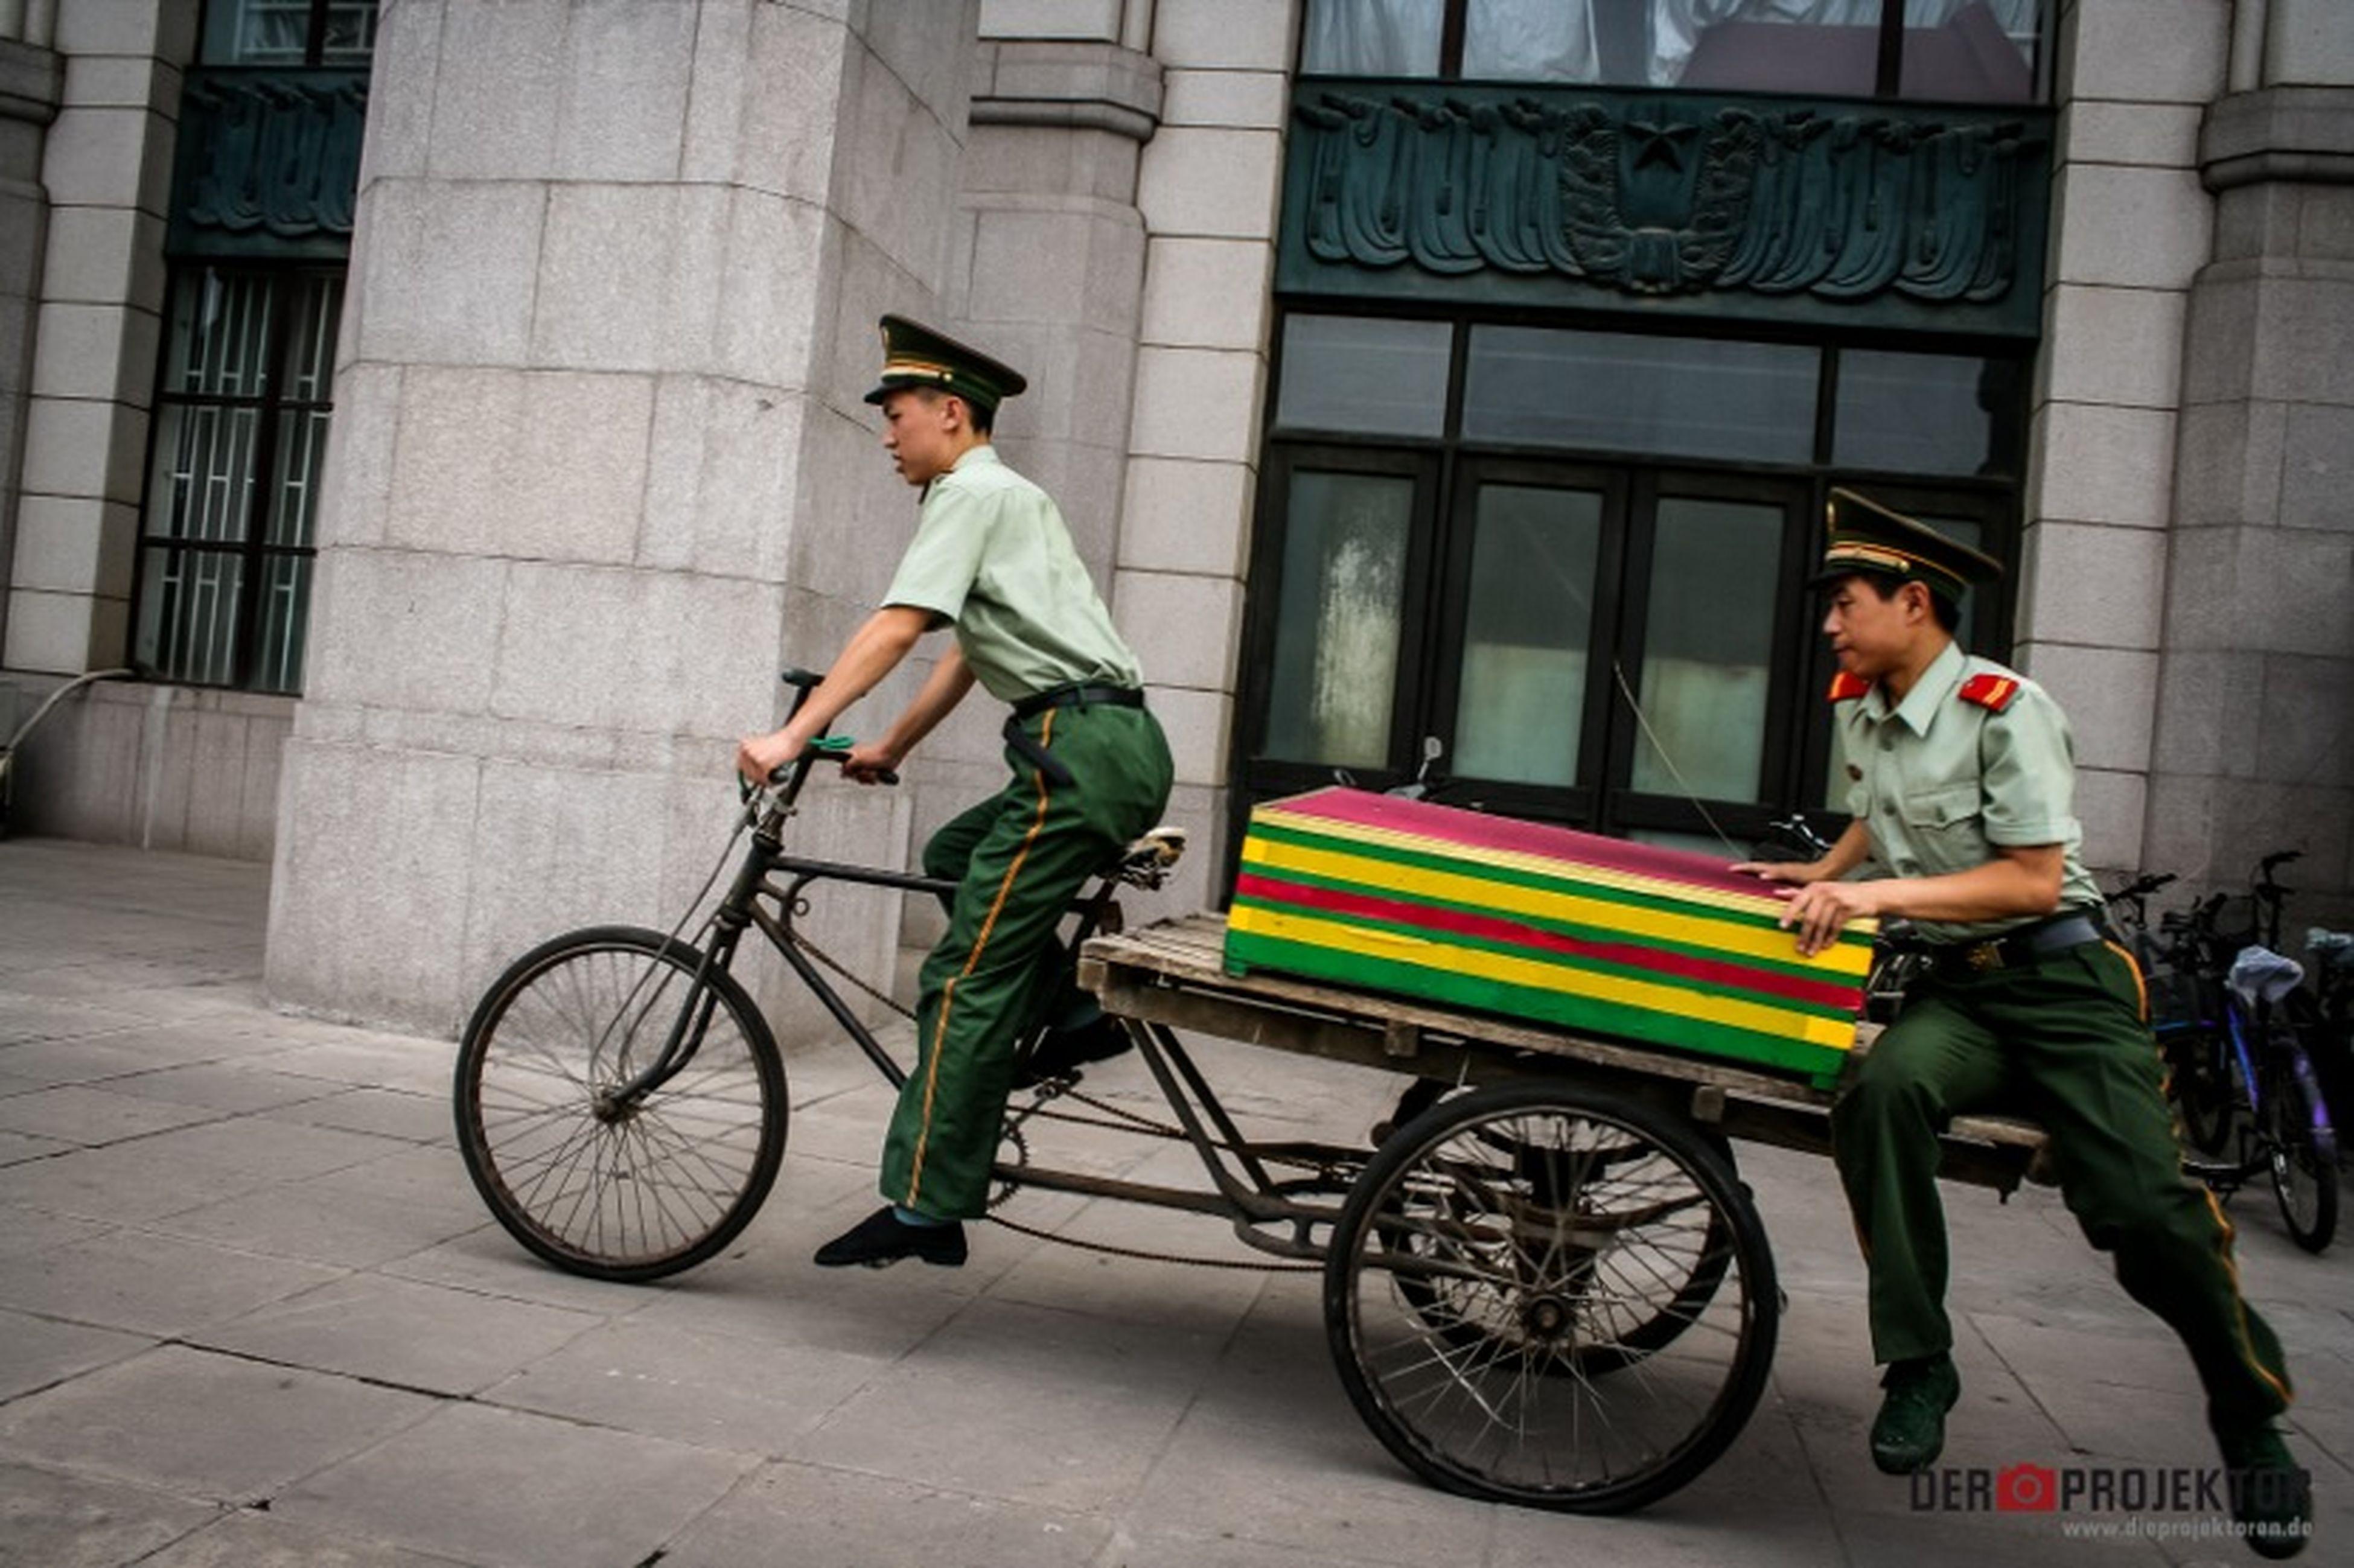 Army transportationin China. China Army #Mobilität